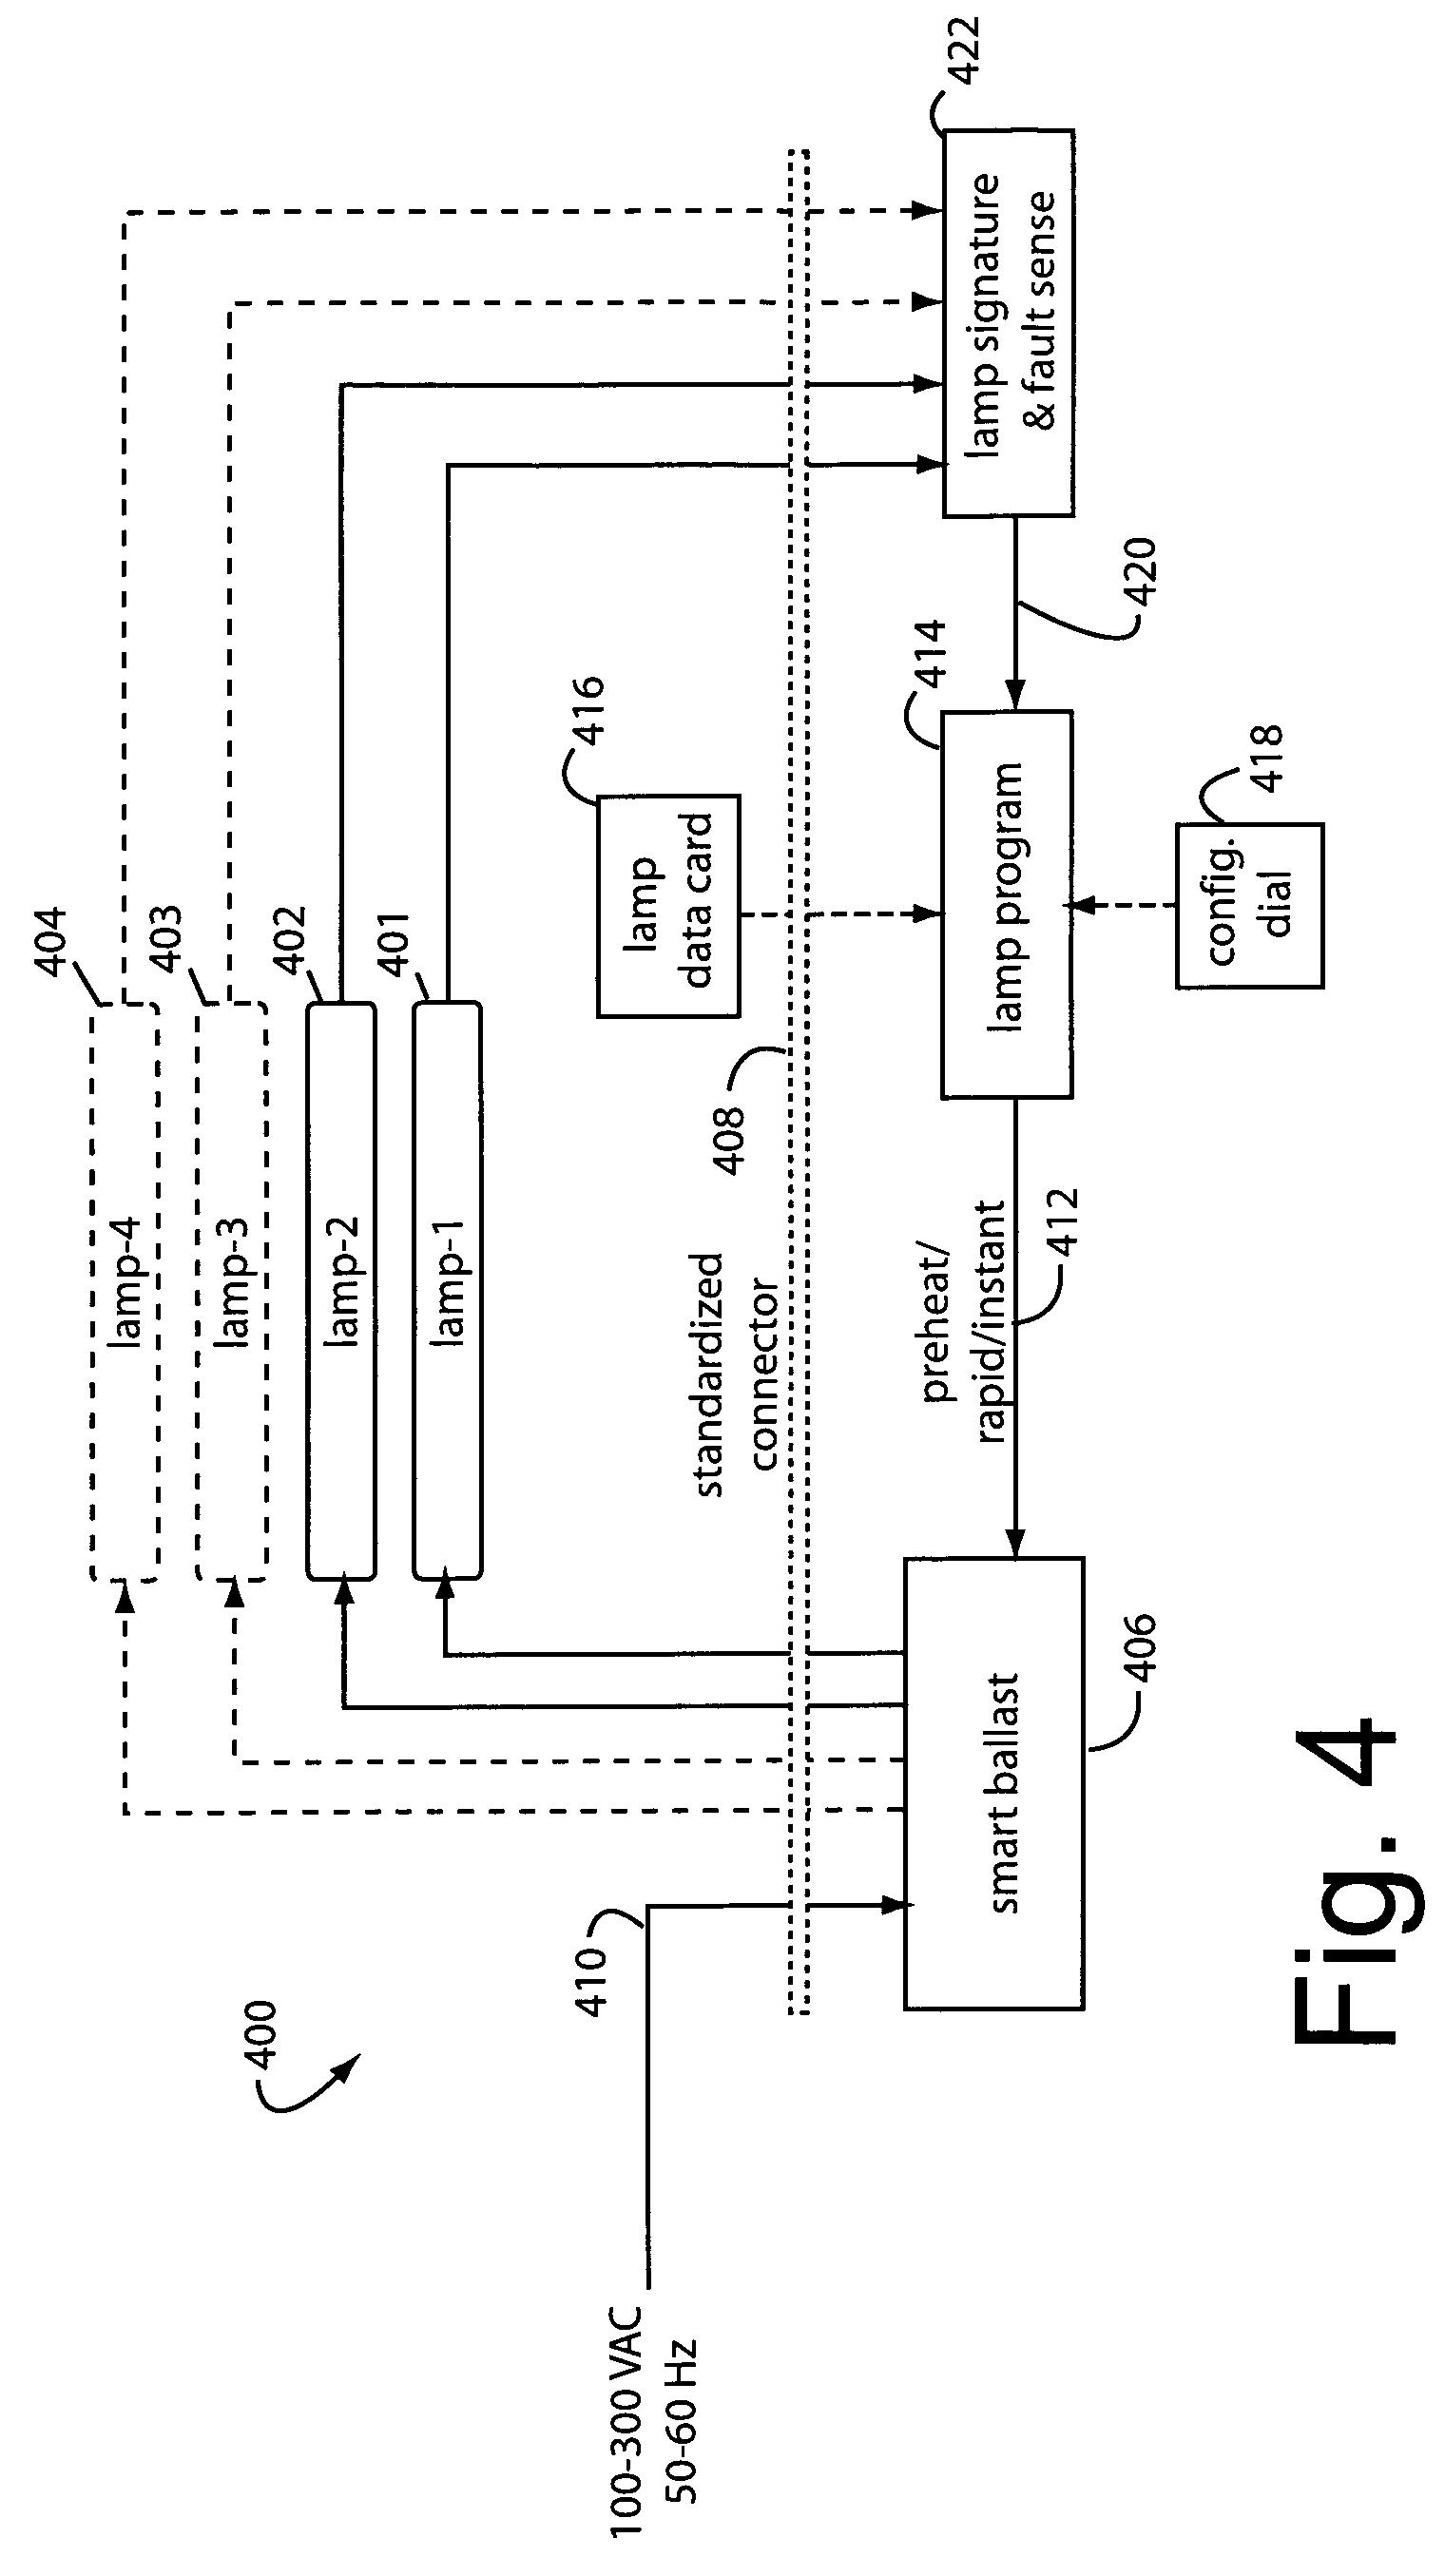 patent us7857498 - quick change fluorescent lamp ballast system